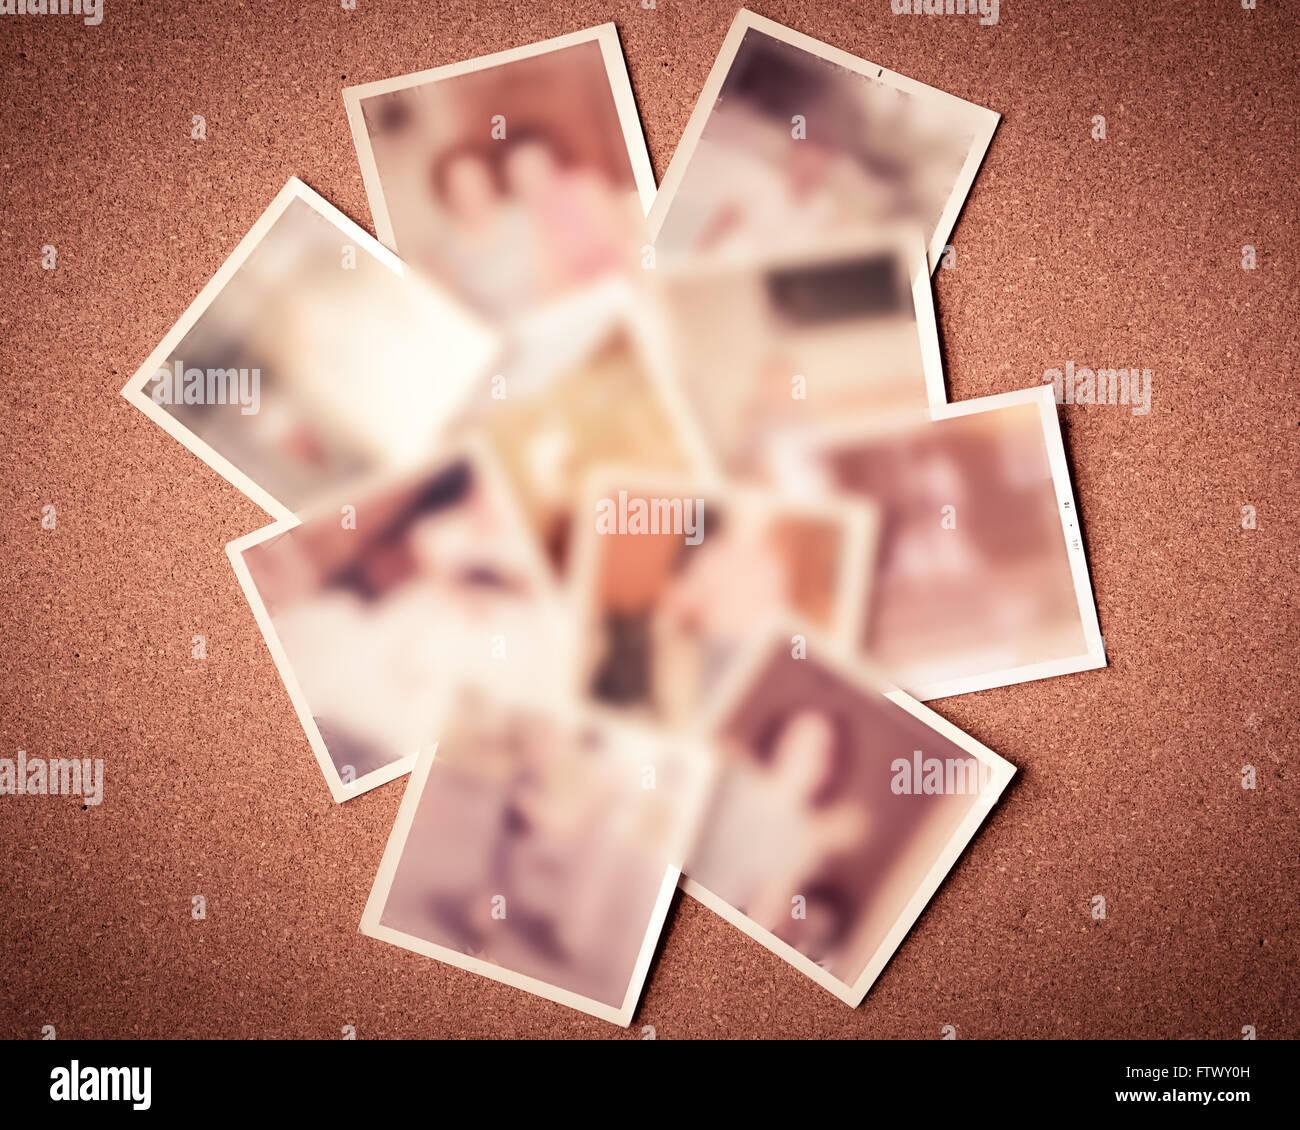 Defokussierten Unschärfe der verstreuten alten Familienfotos gegen Pinnwand Stockbild